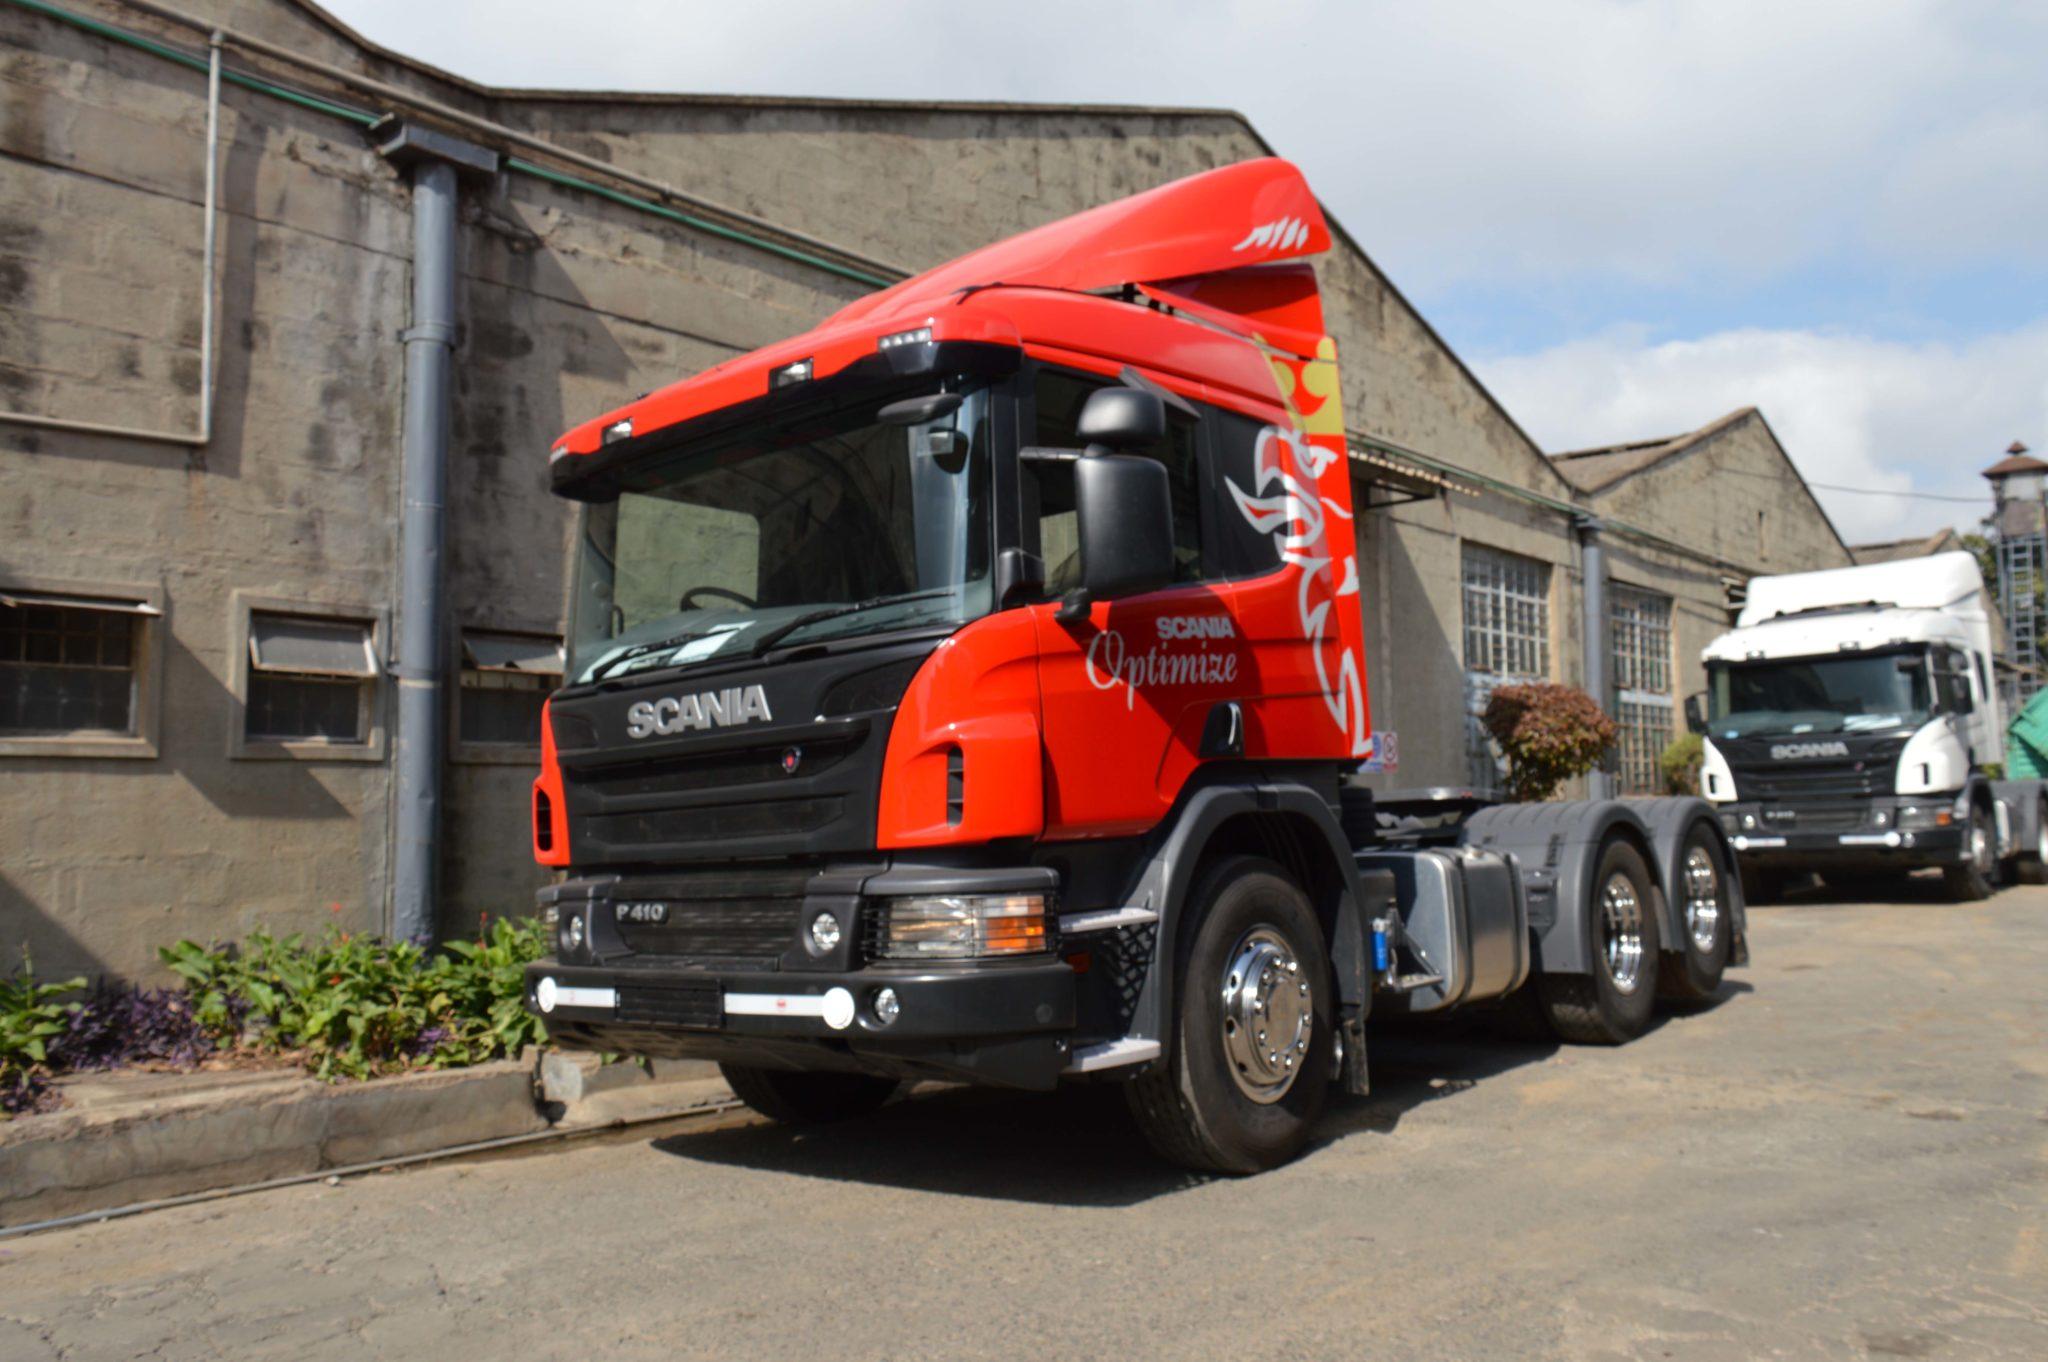 P410 LA6x2 HSA Scania Optimize truck